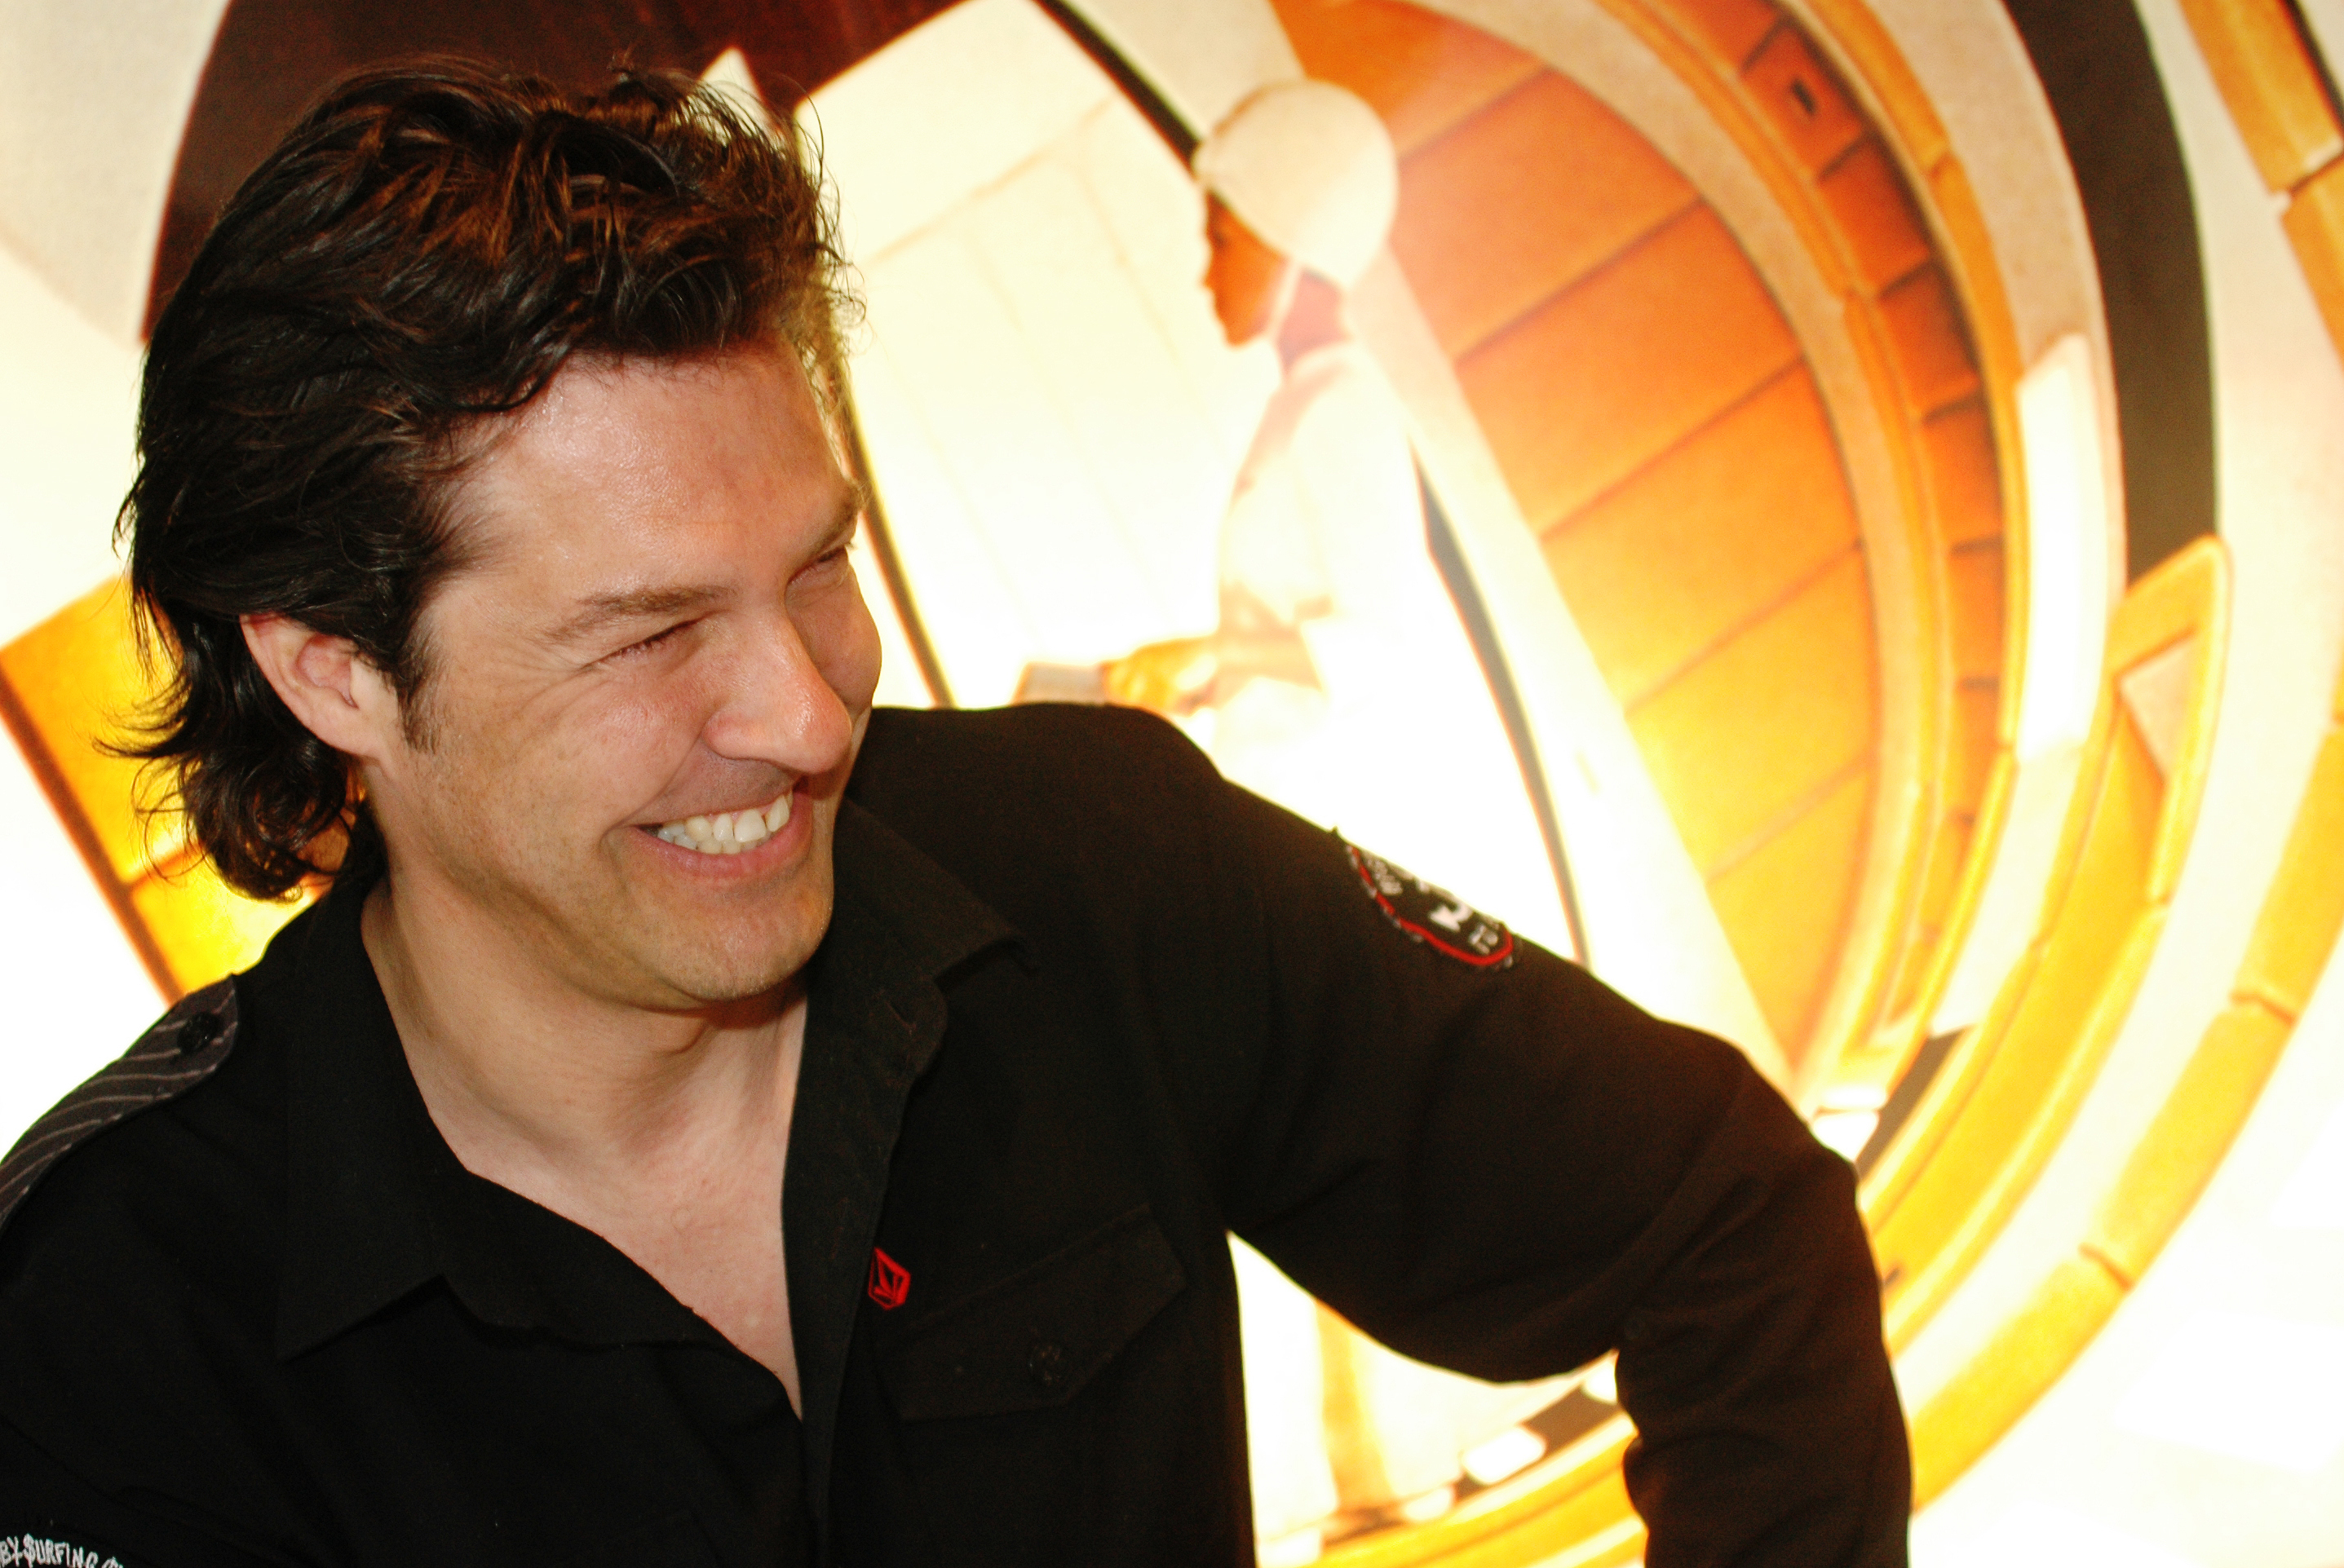 Jean-Guy Chabauty